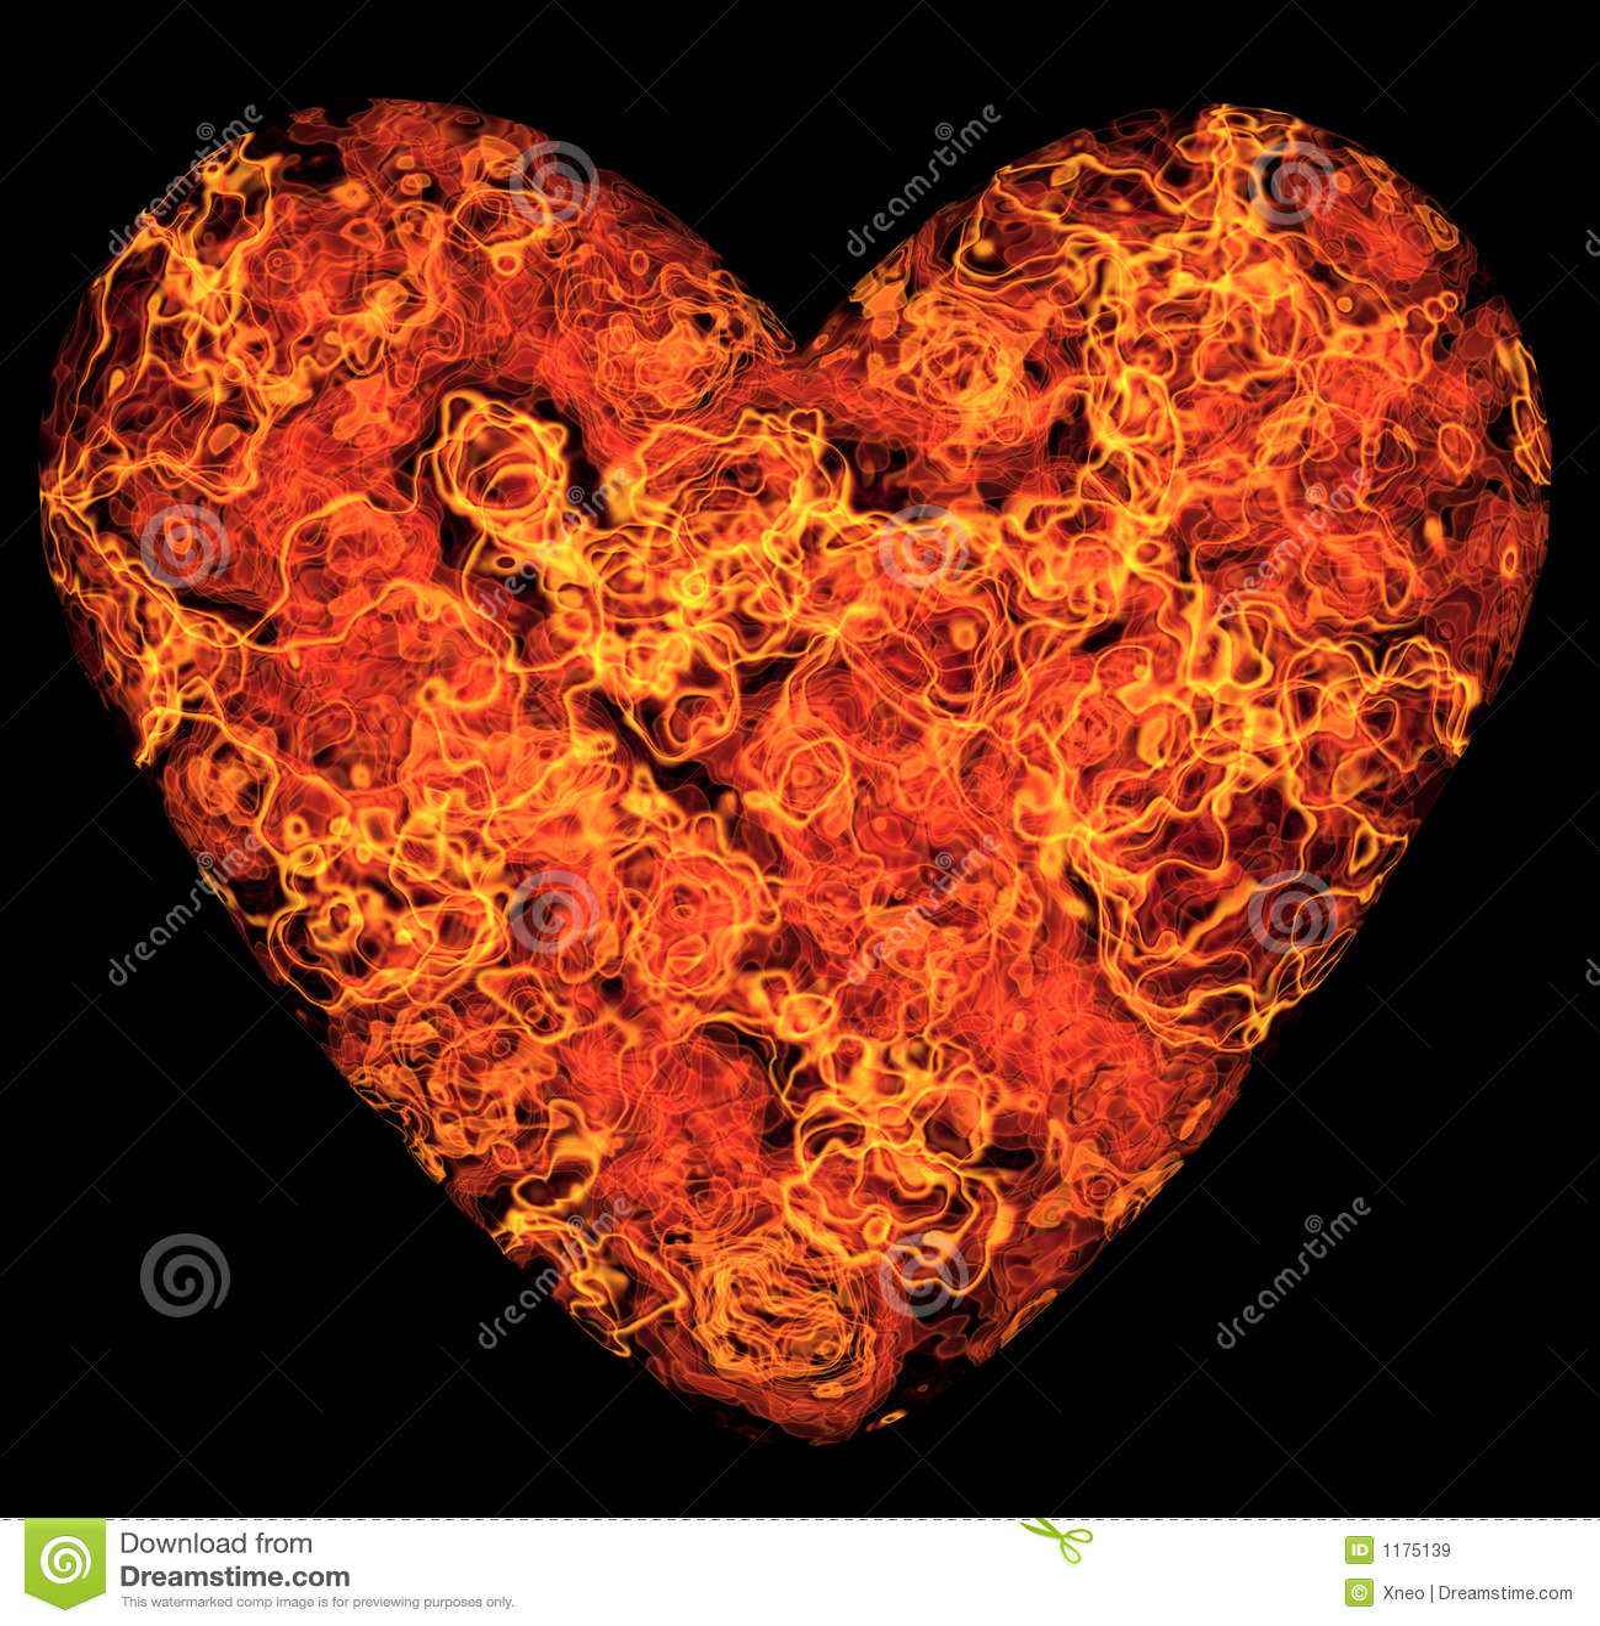 59f2b1c1038d Flaming Heart stock illustration. Illustration of magic - 1175139